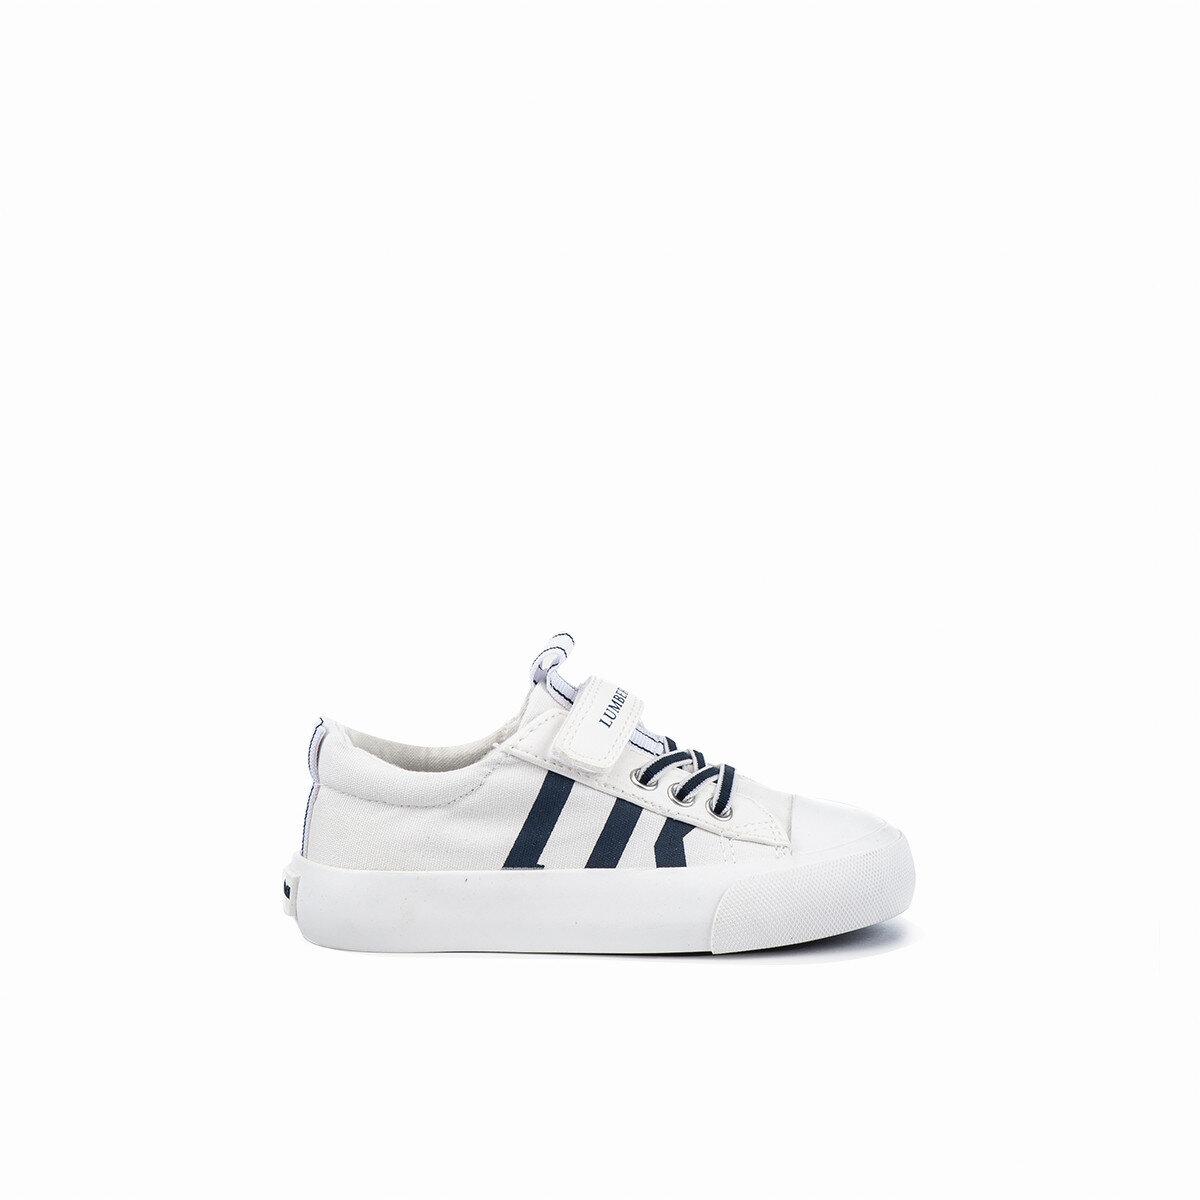 VULKY Sneakers Bambino